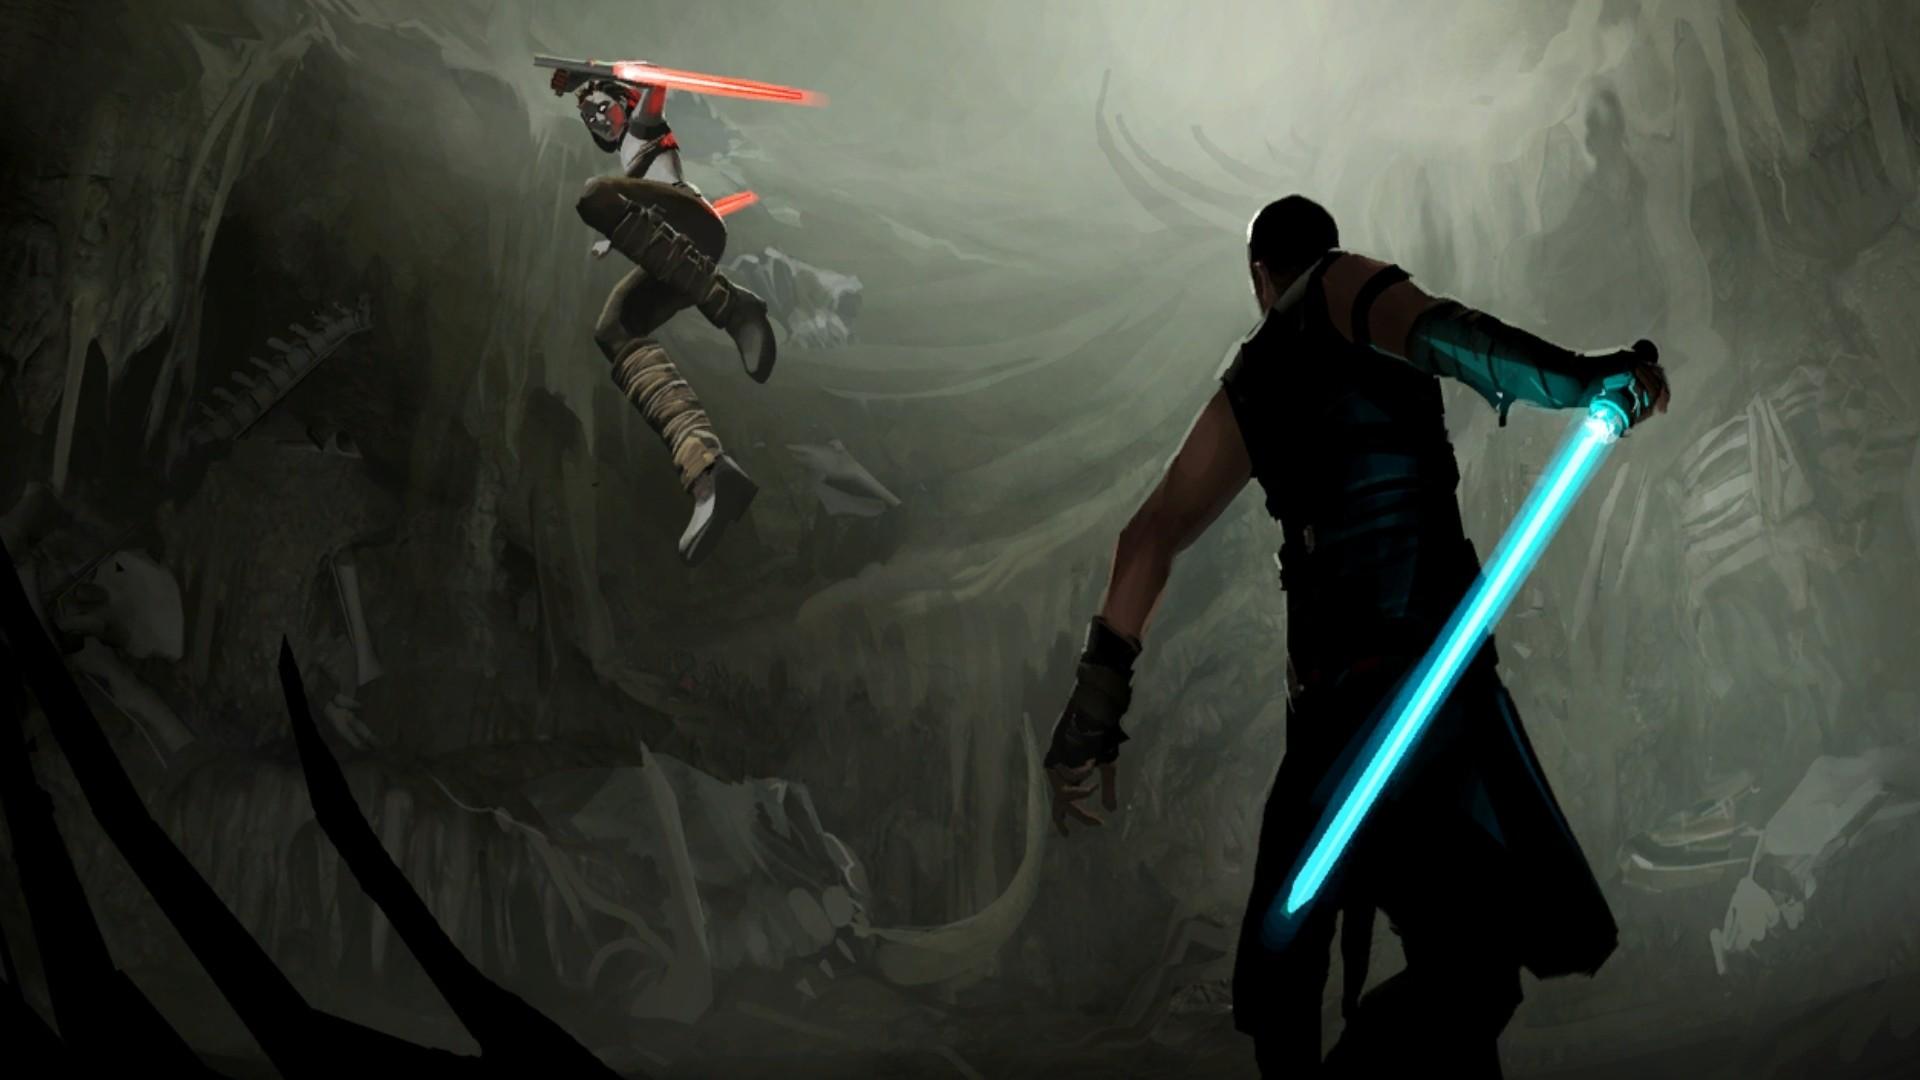 Star Wars Jedi Wallpapers 1080p As Wallpaper HD